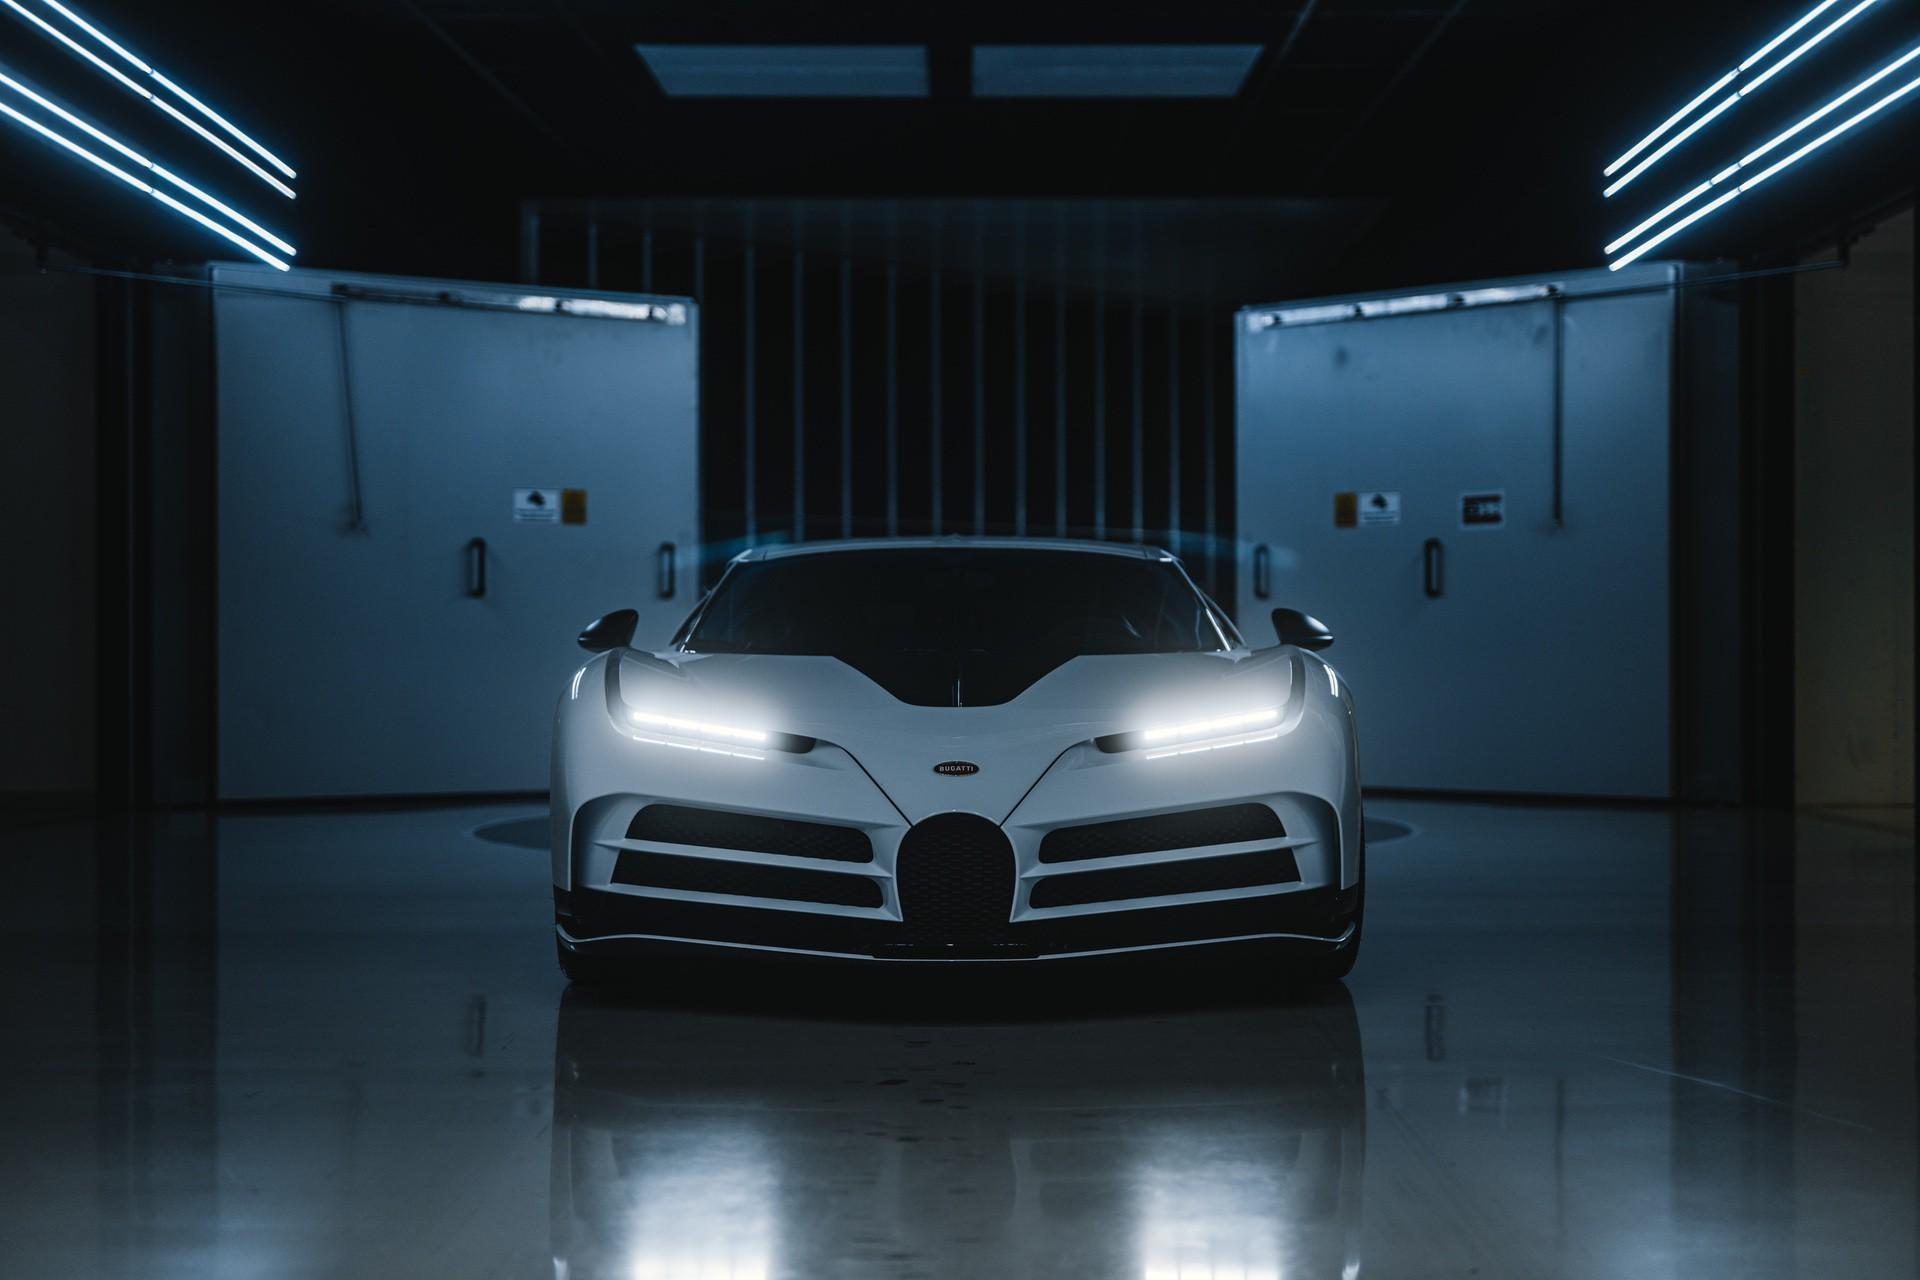 Bugatti_Centodieci_windtunnel_tests-0003